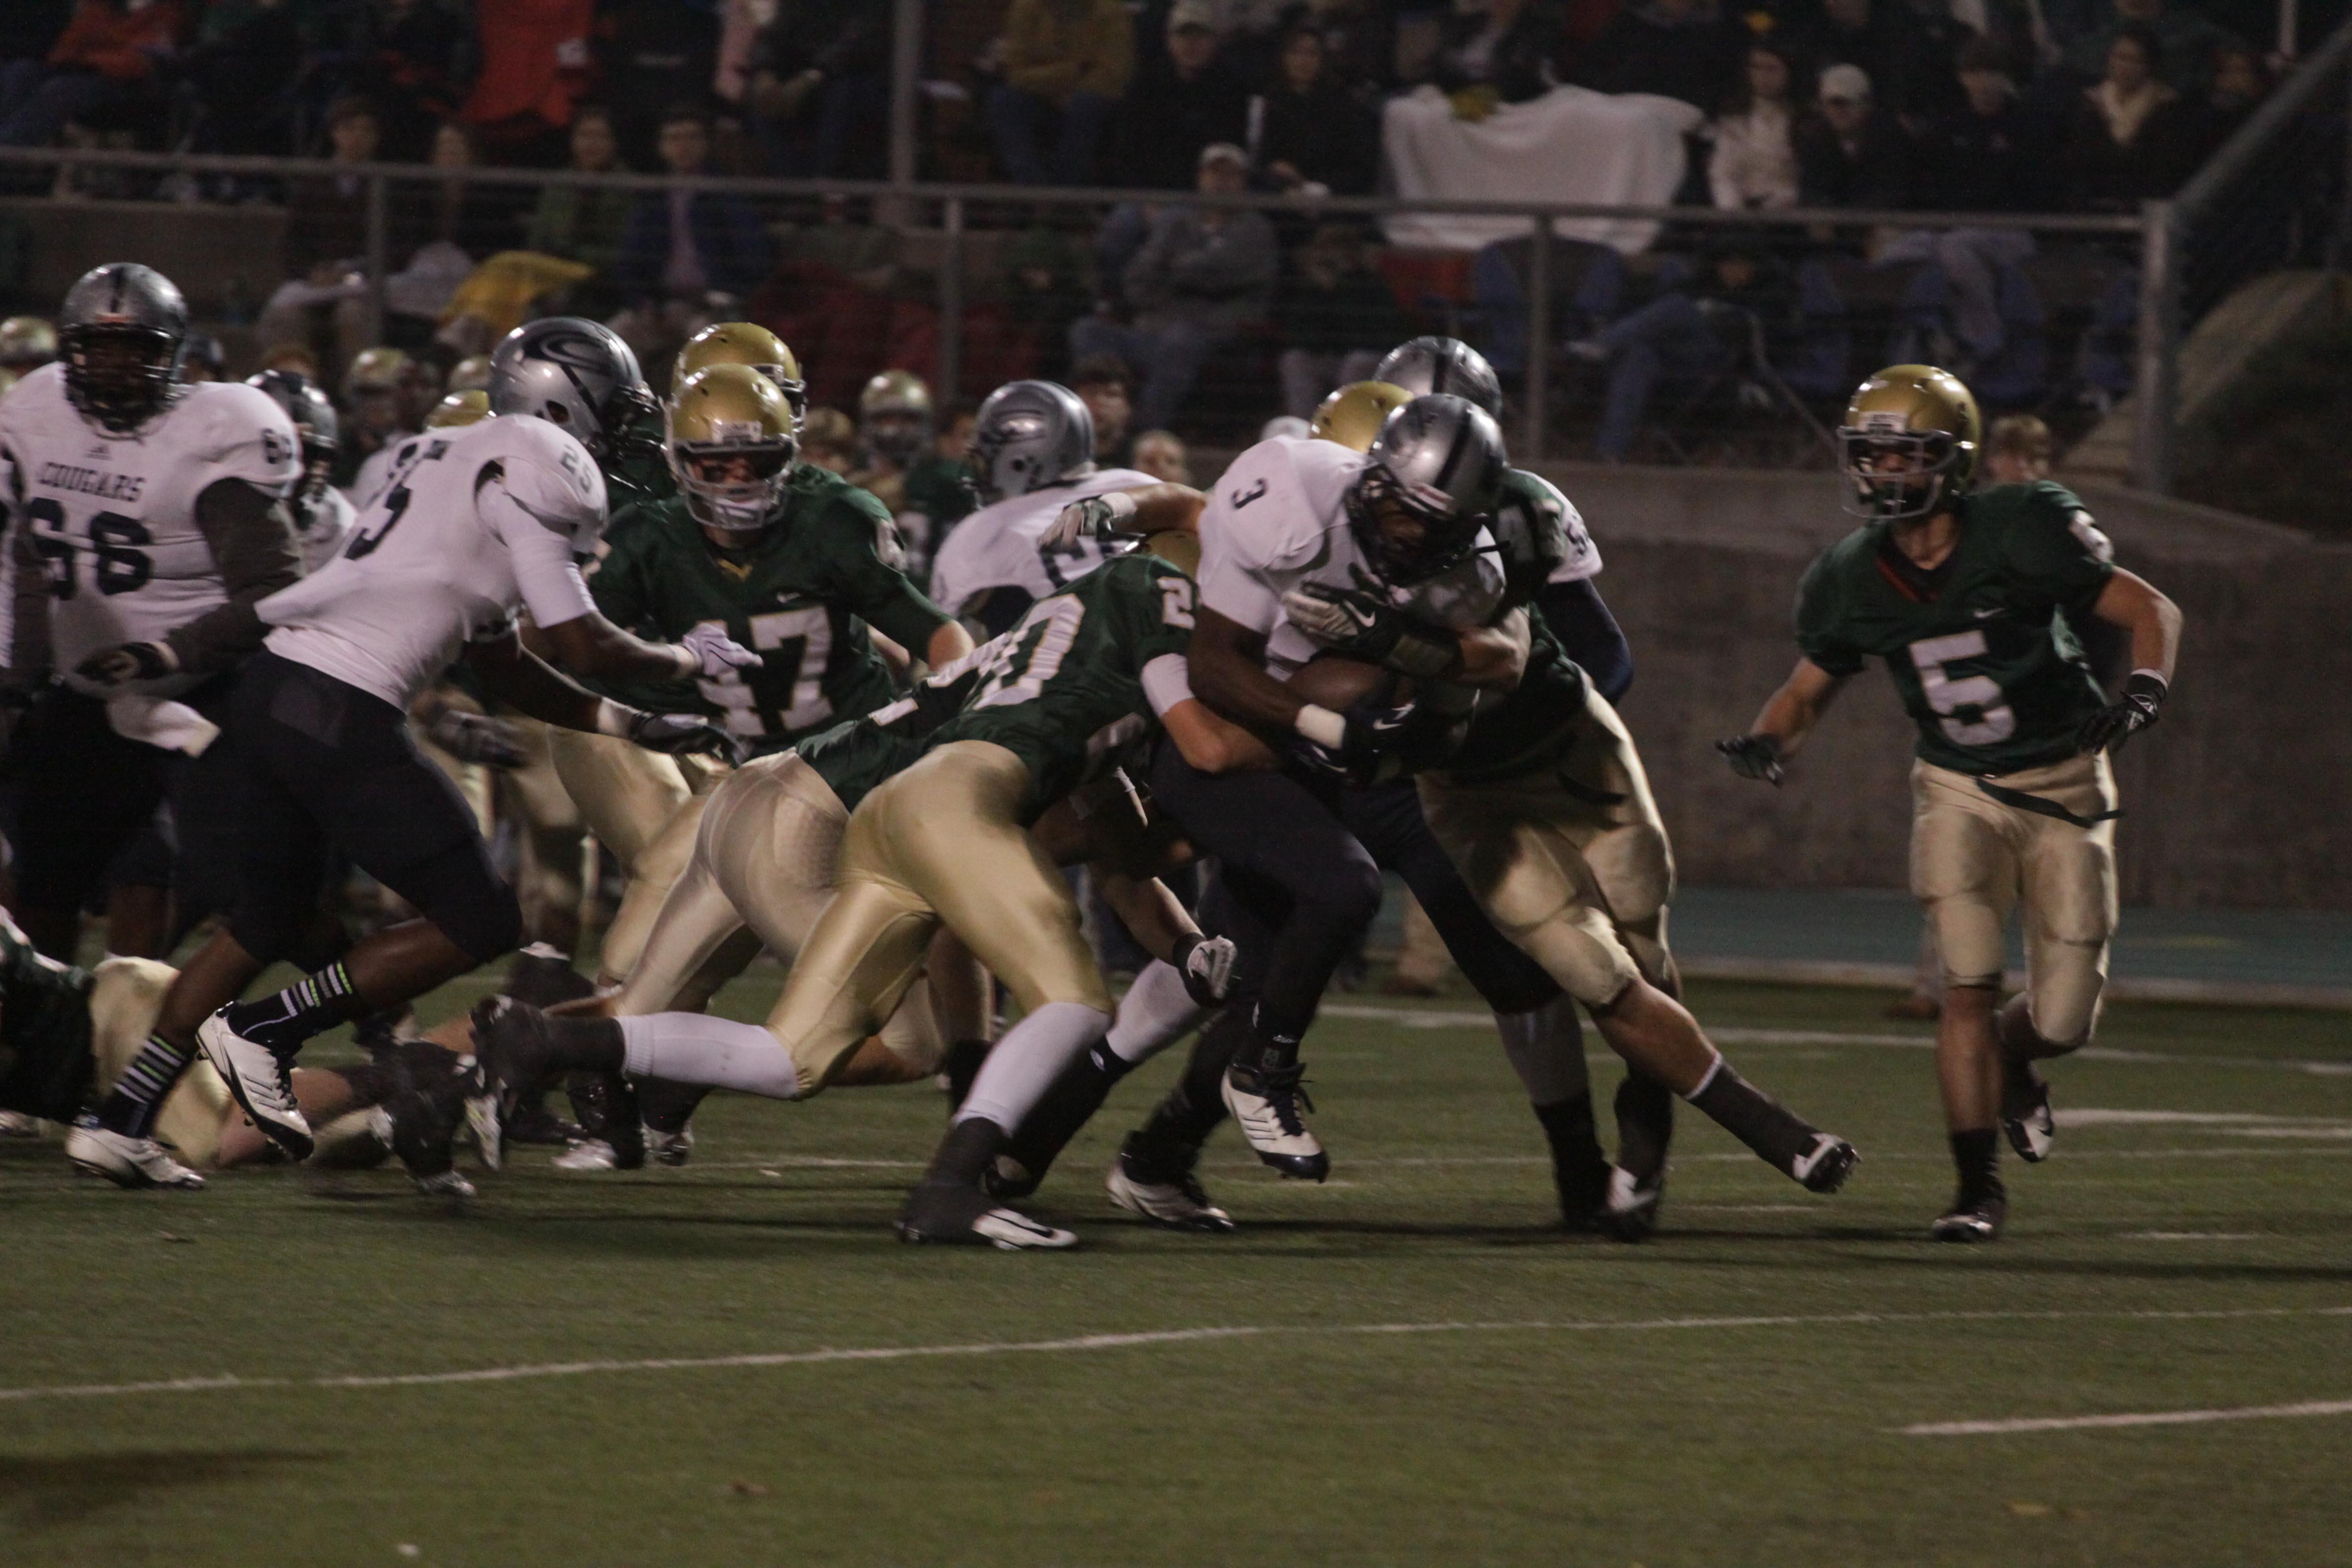 Cougars defeat Spartans 30-9